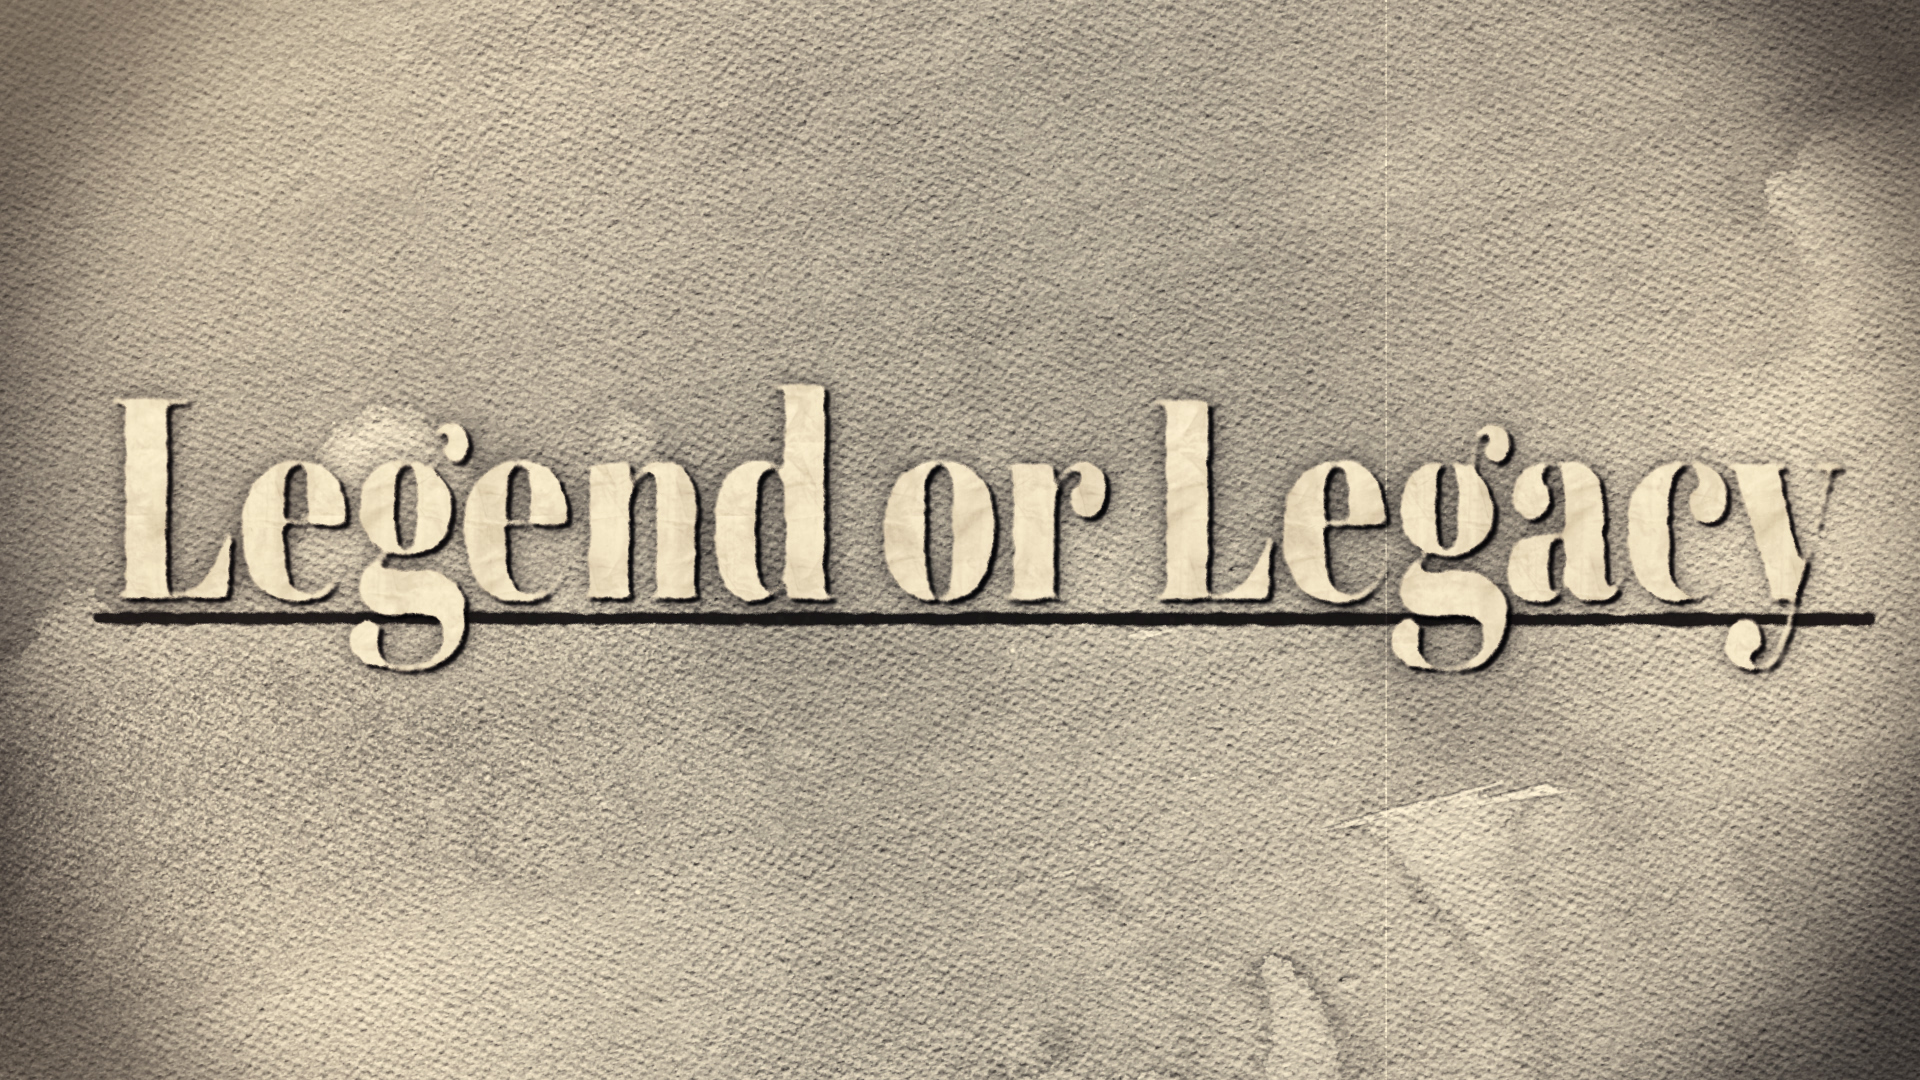 legend or legacy (Converted)0.jpg